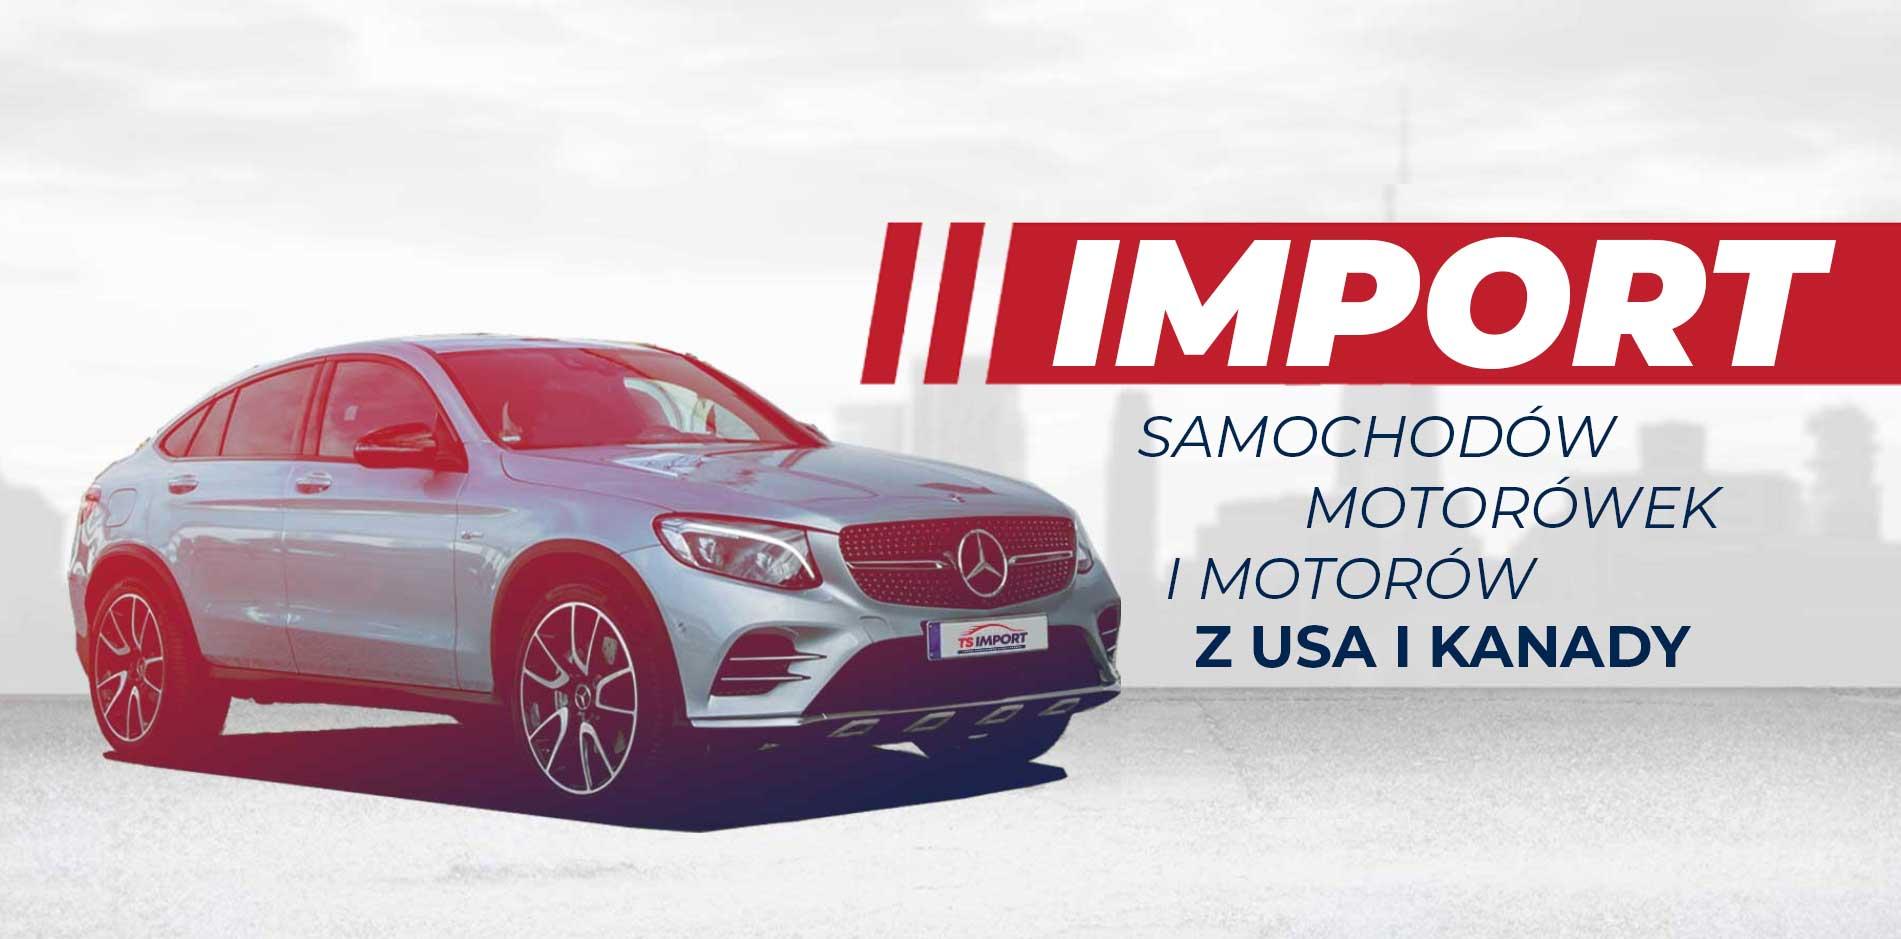 TSIMPORT - Import samochodów zUSA iKanady